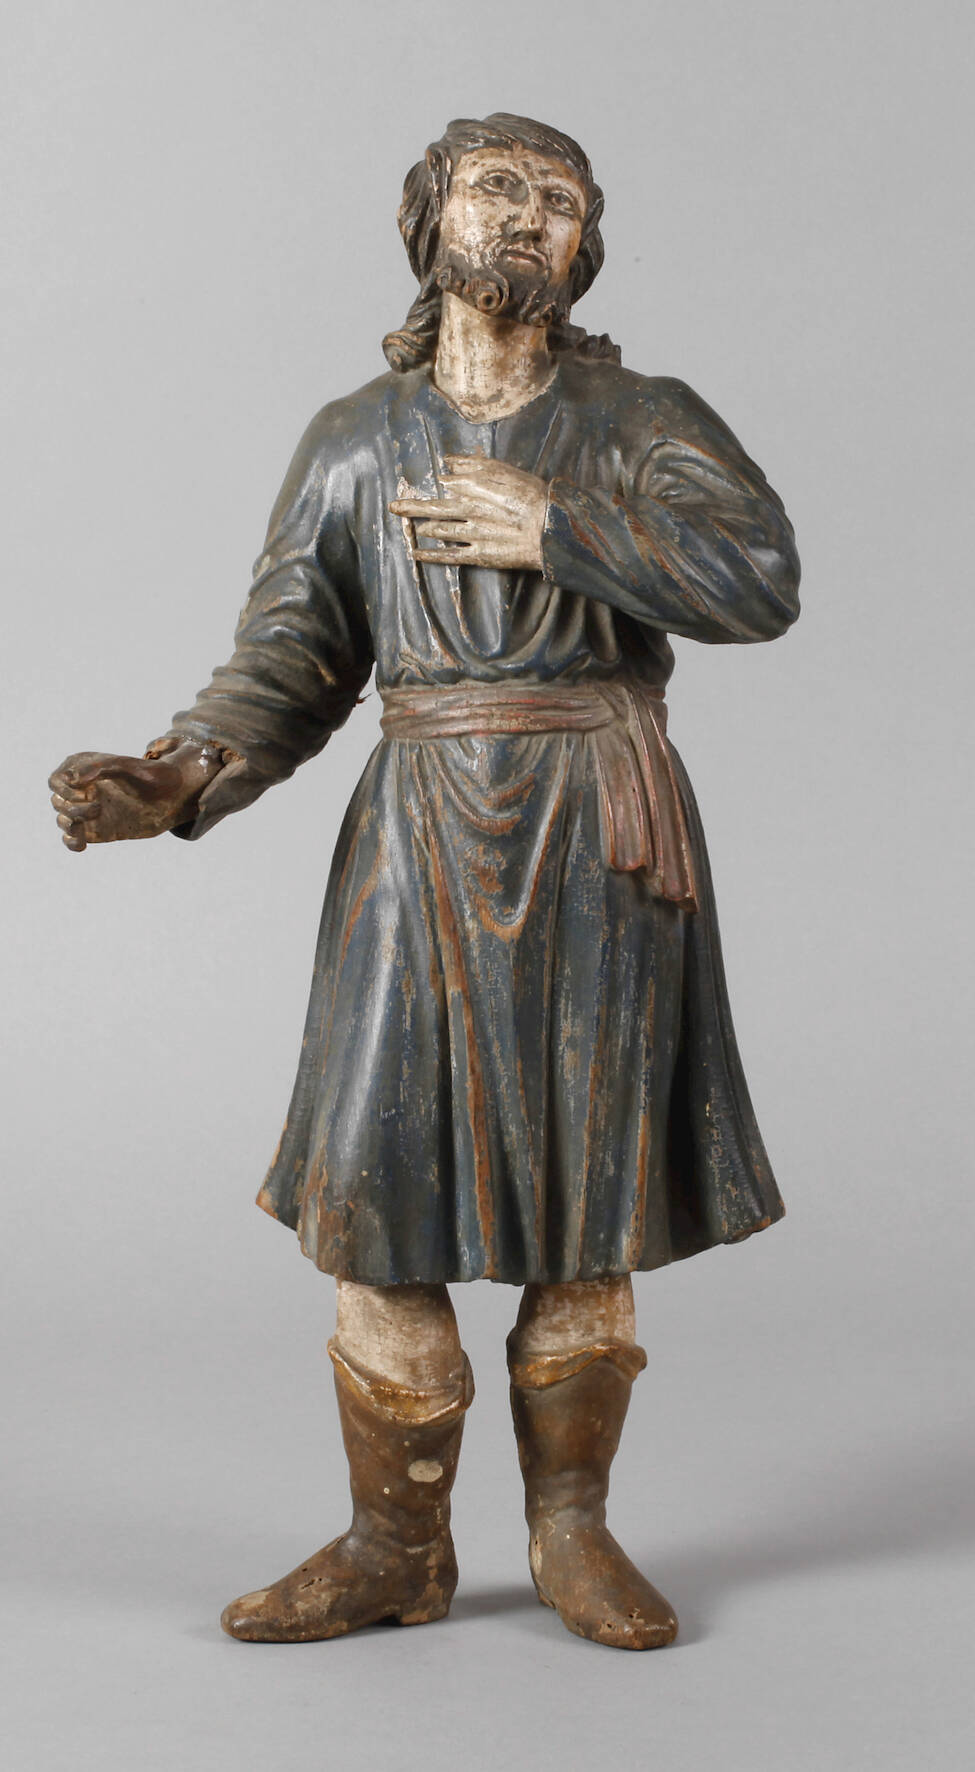 Geschnitzte Heiligenfigur